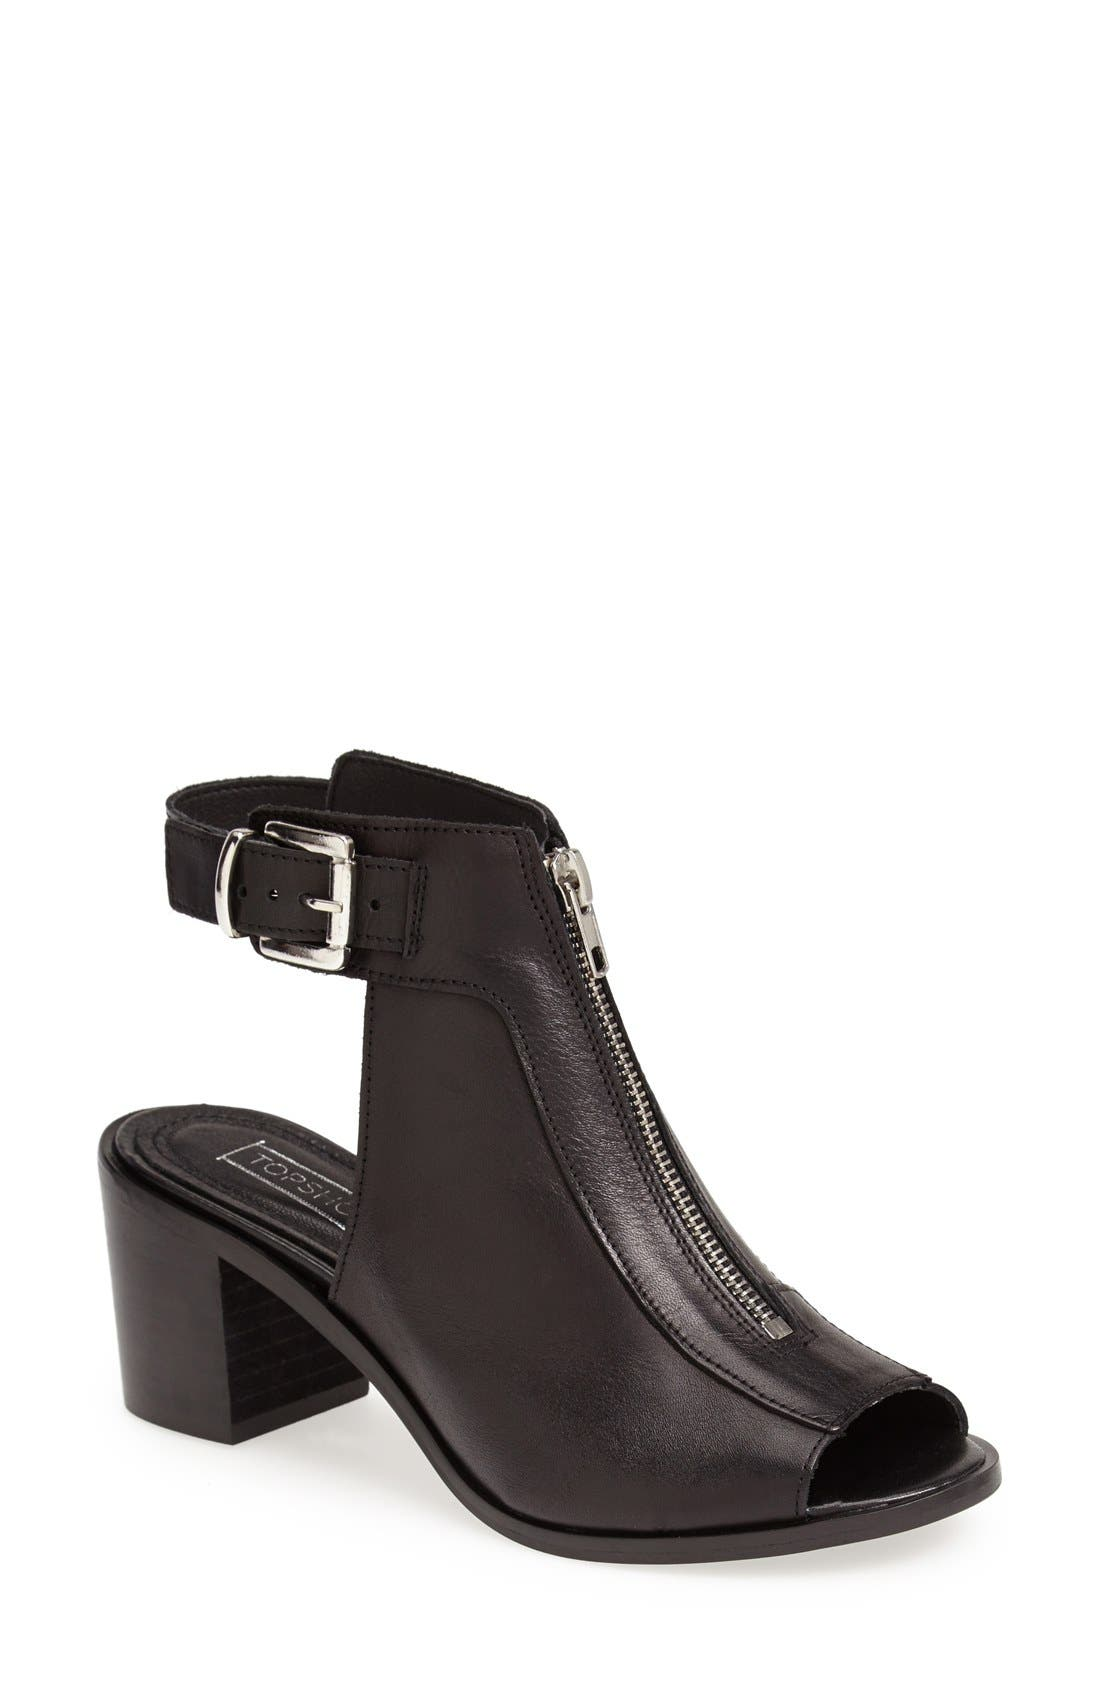 Alternate Image 1 Selected - Topshop 'Jada' Zip Front Sandal (Women)